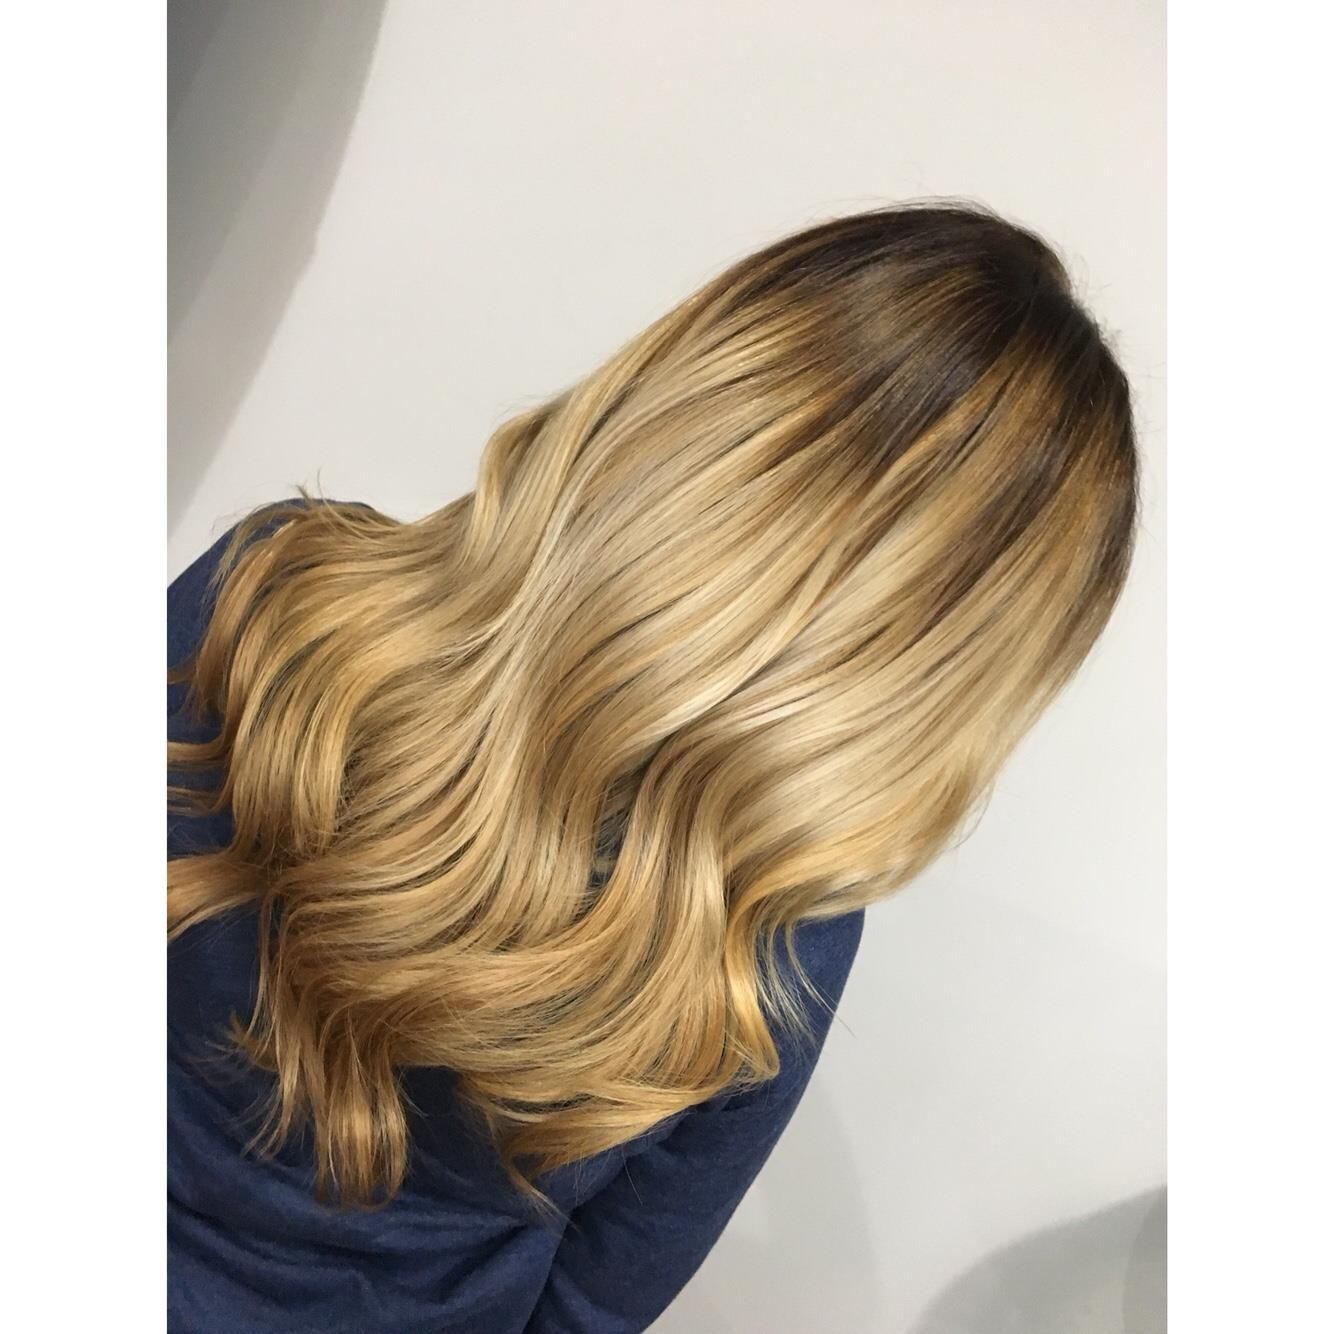 Hair Extension Application Hairlicious3 Pinterest Hair